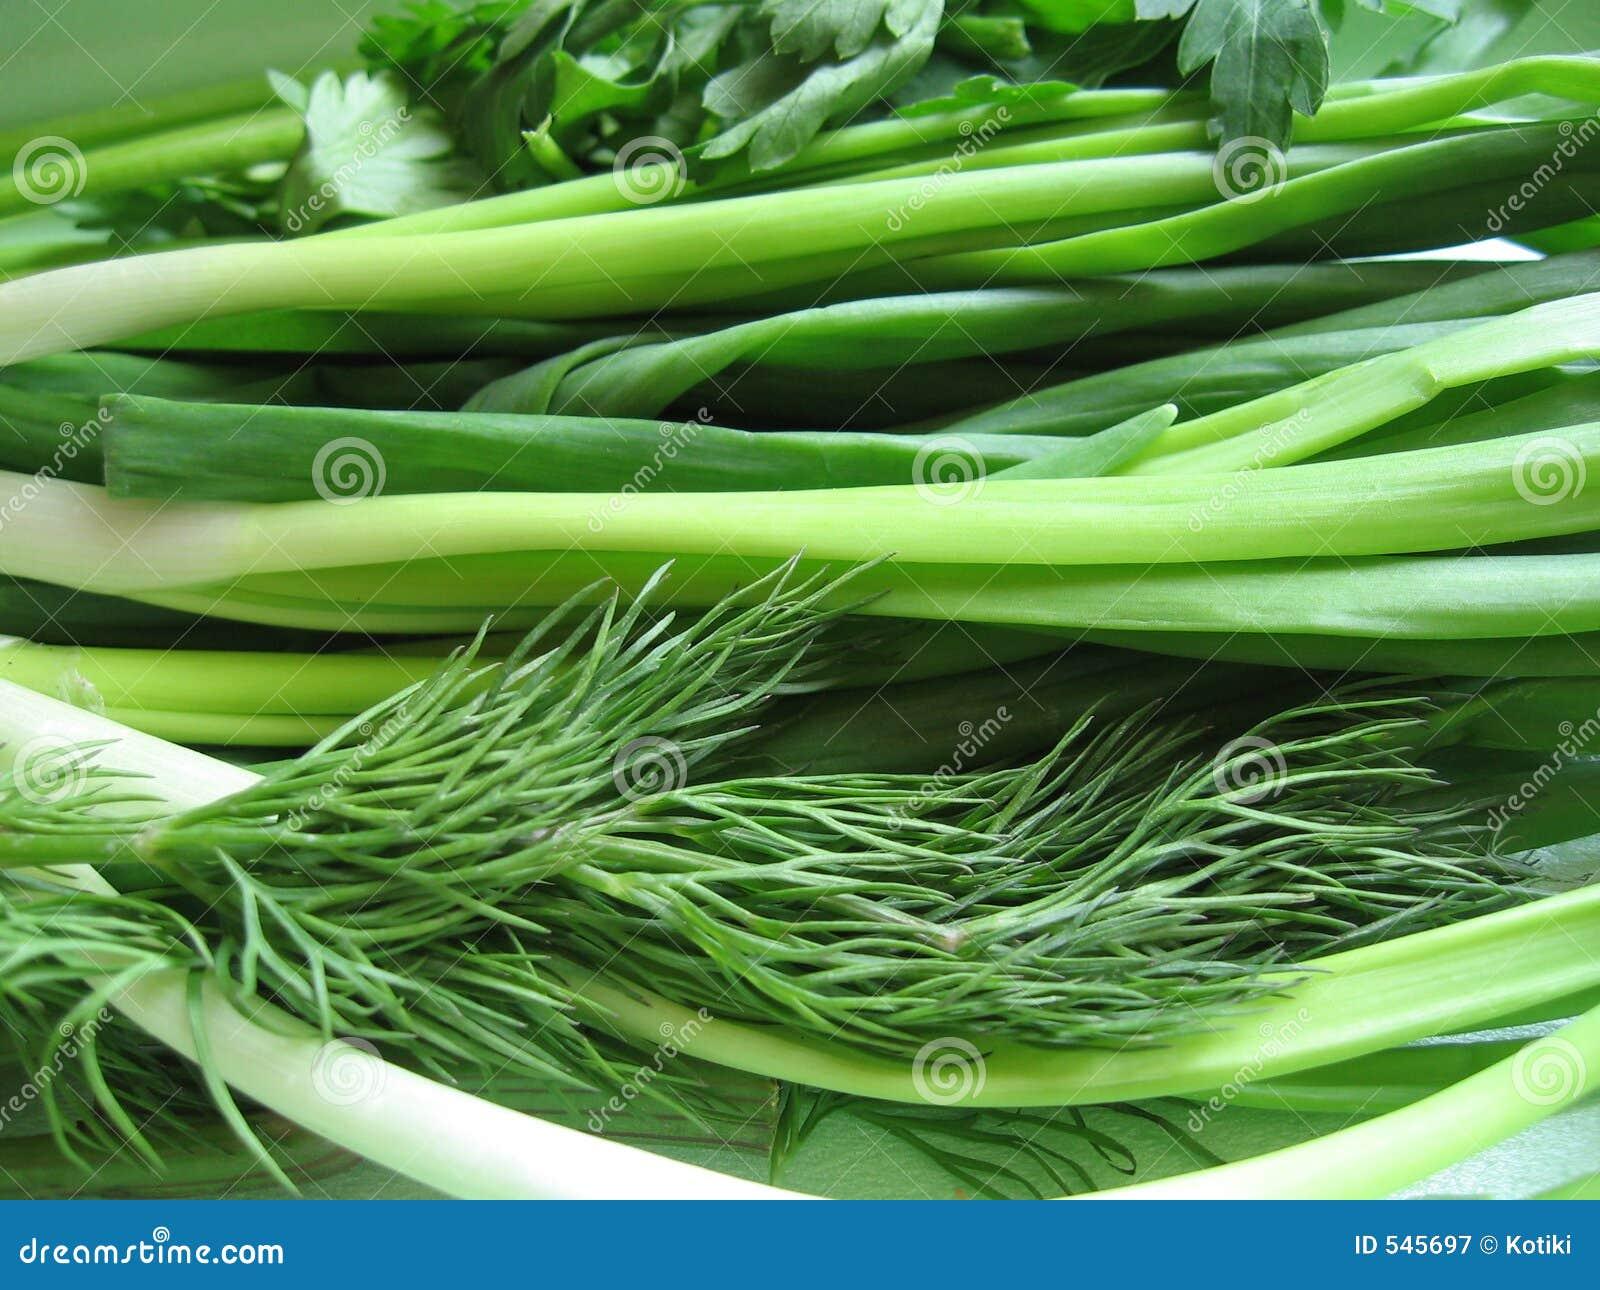 Download 绿色 库存图片. 图片 包括有 调味料, 香料, 健康, 类似, 词根, 食物, 美味, 绿色, 关闭, 宏指令 - 545697